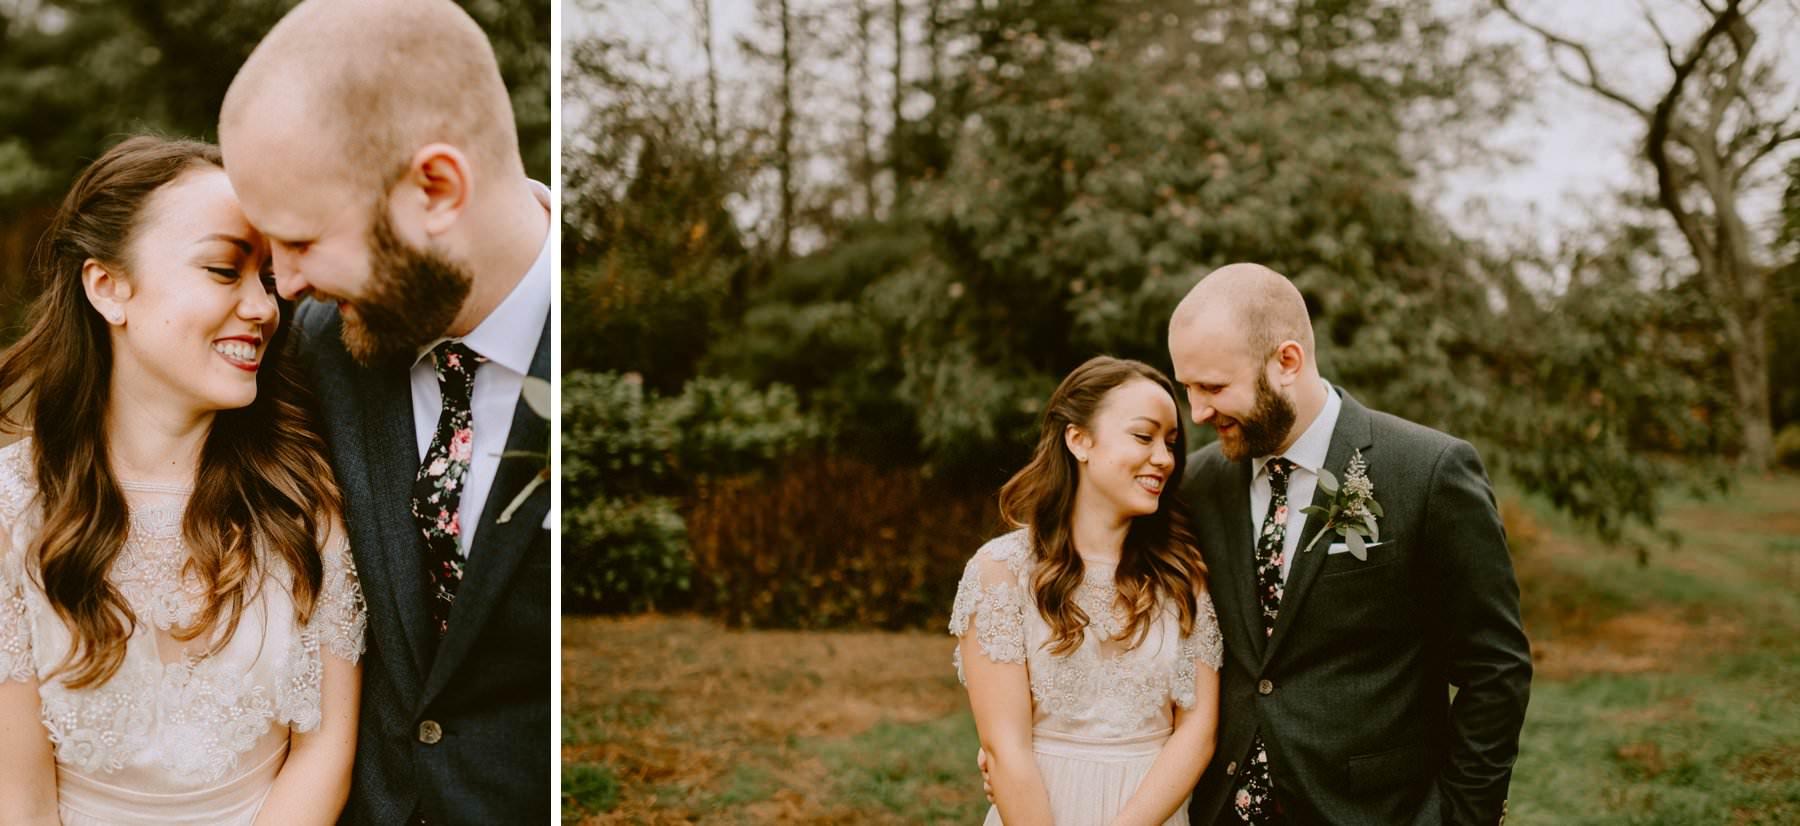 Tyler_arboretum_wedding-031.jpg